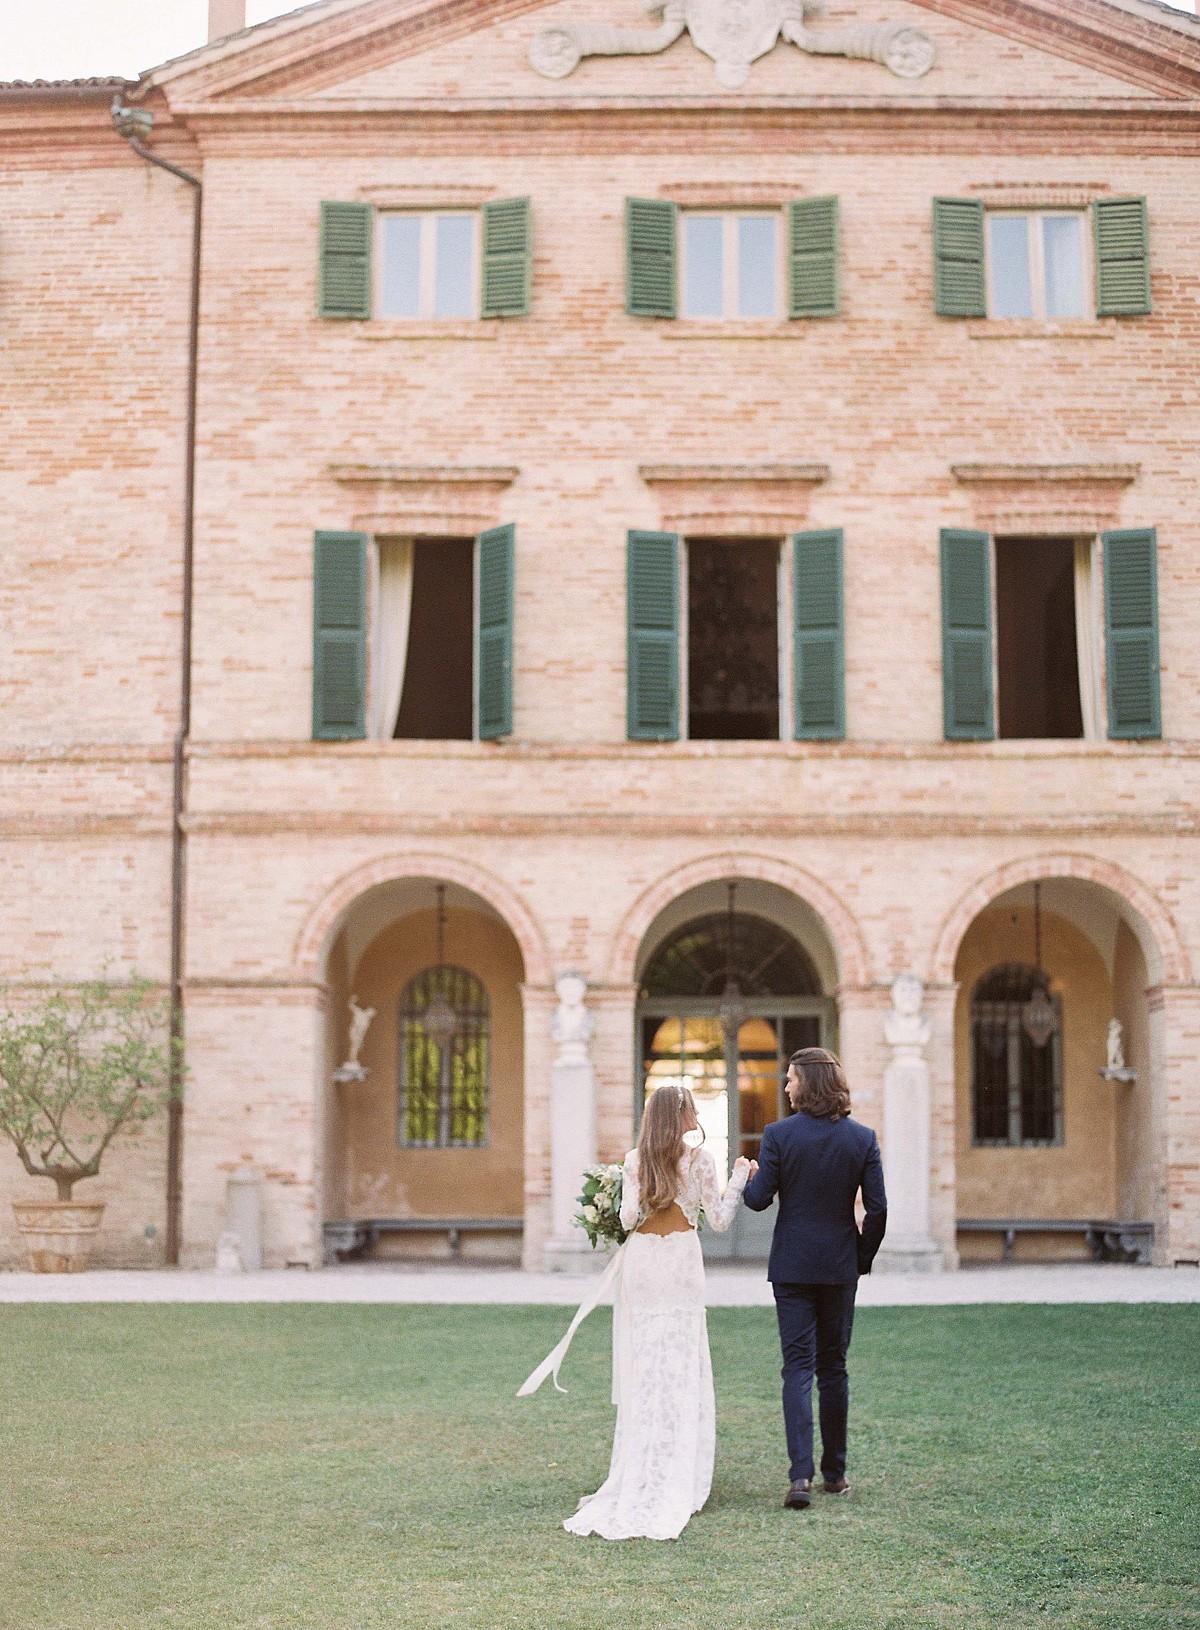 Reminiscent Destination Wedding in Italy